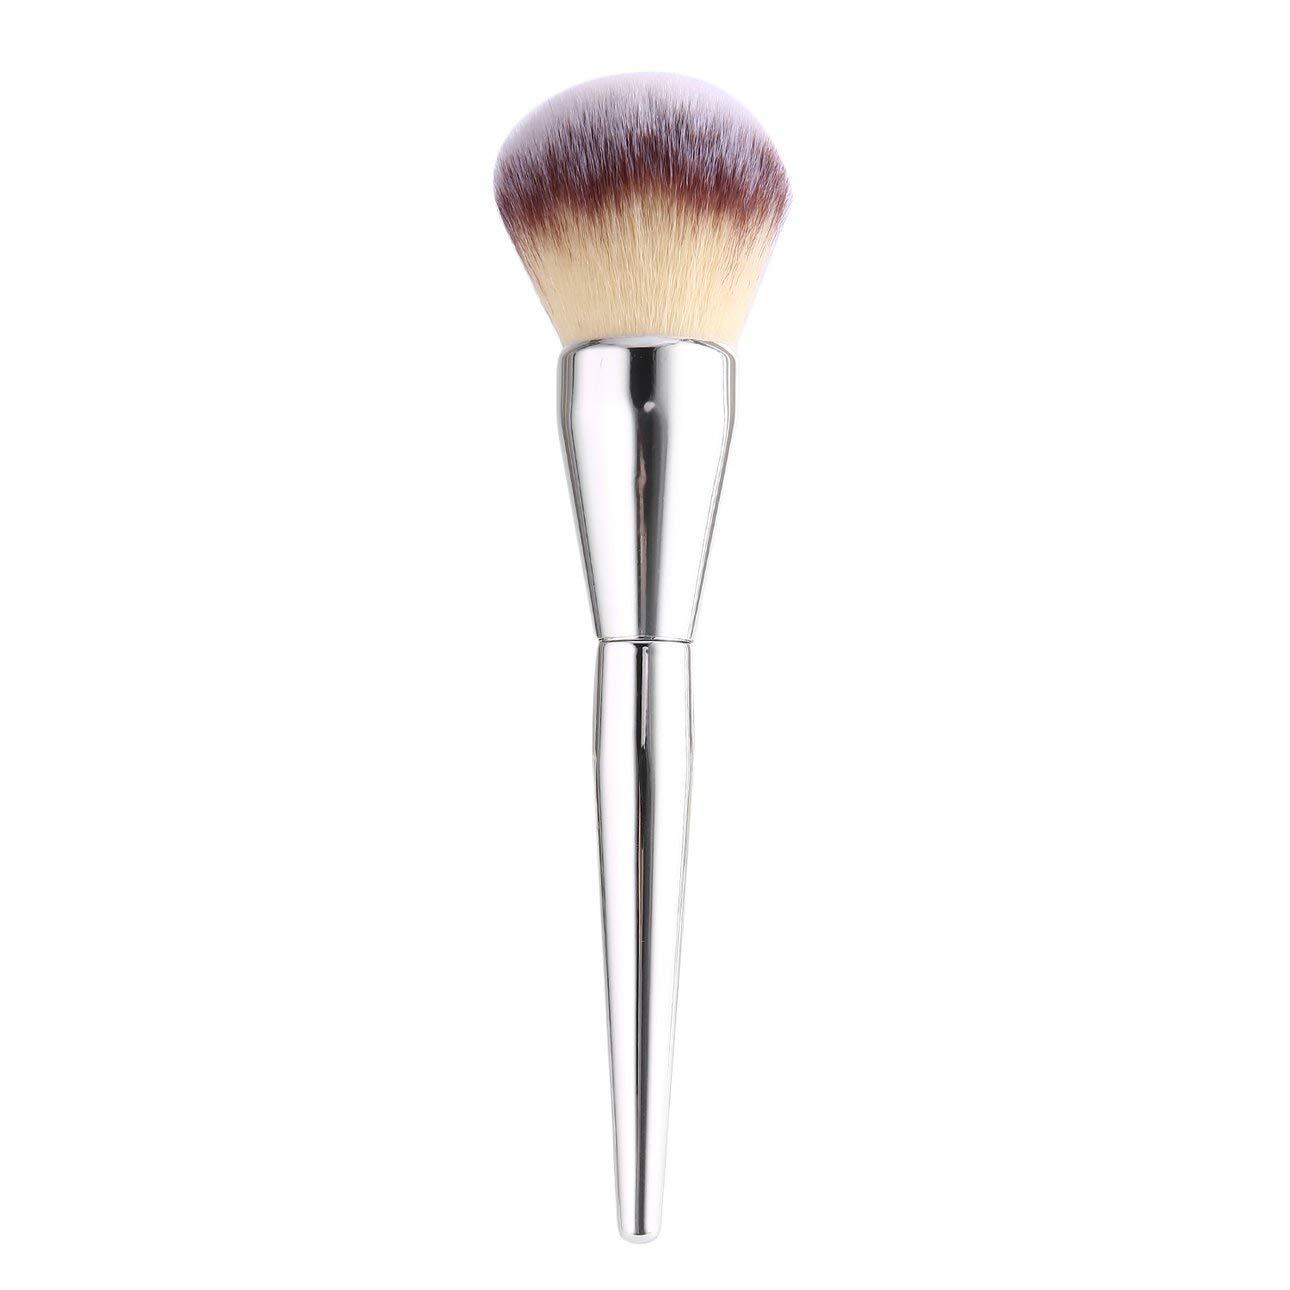 Liobaba Professional Make-up Brush Soft Facial Foundation Brush Blush Round Cosmetics Brush Tool with Big Brush Head